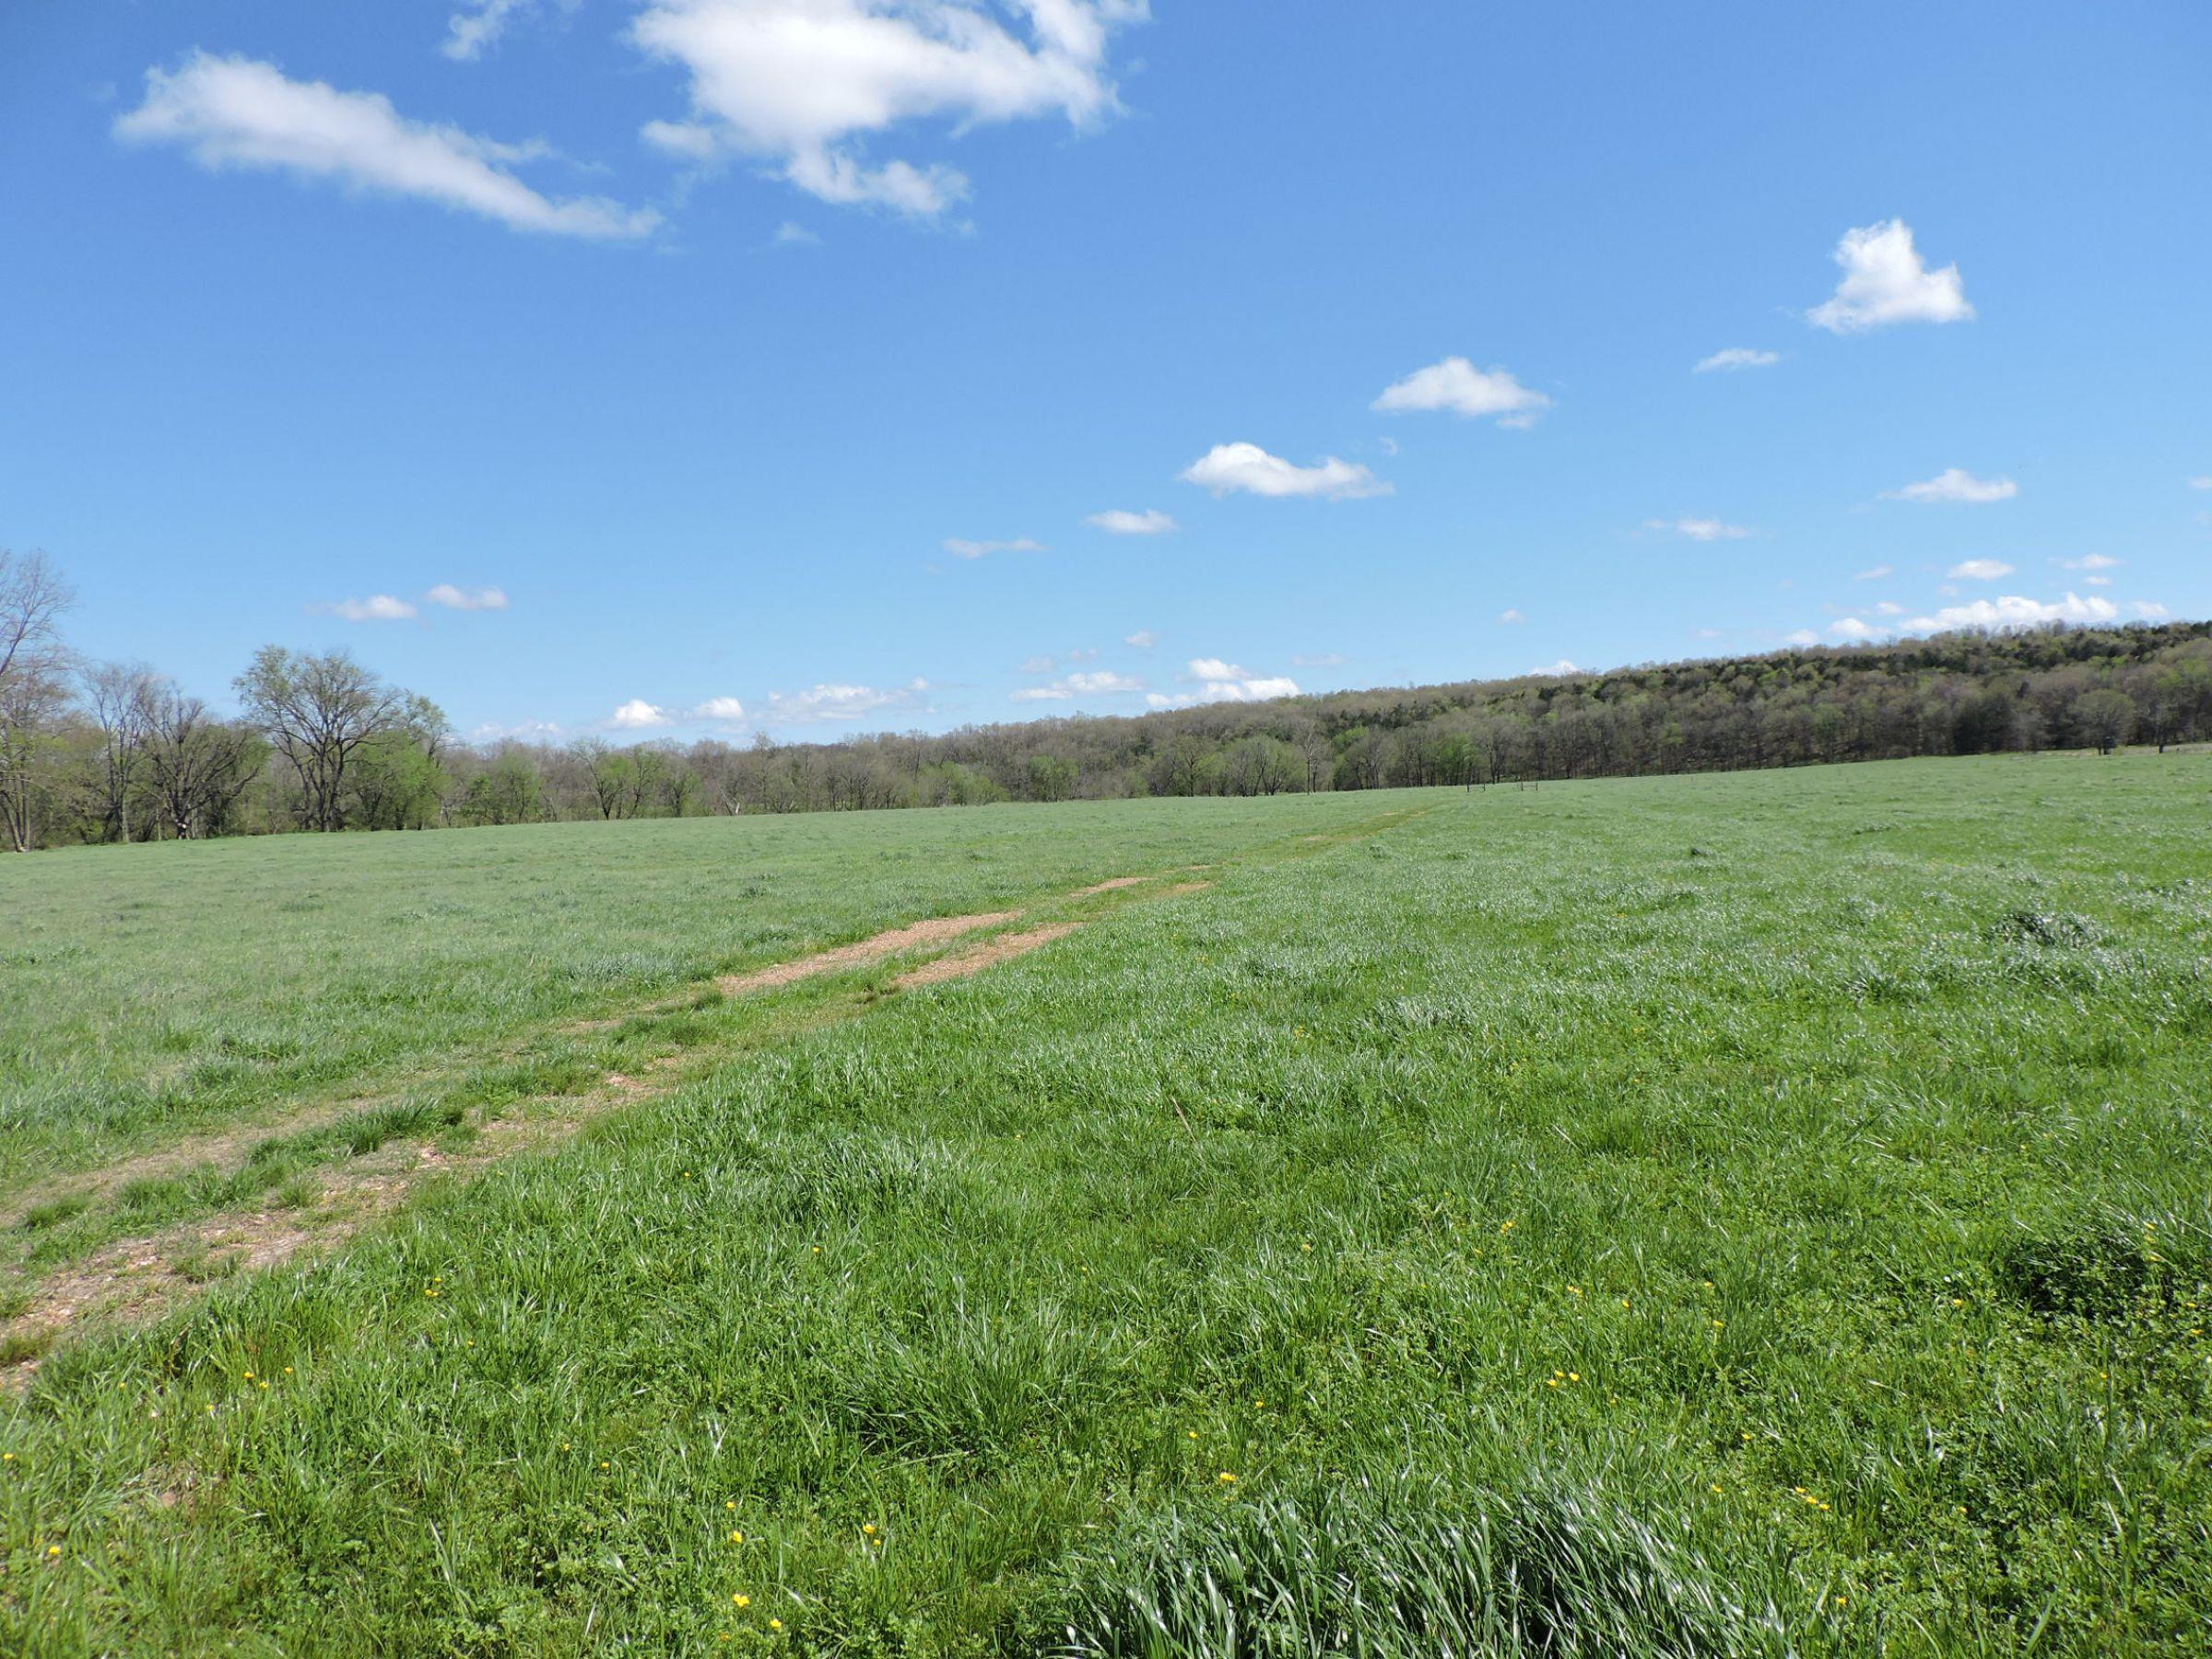 land-sharp-county-arkansas-695-acres-listing-number-15405-10-2021-04-13-213612.JPG